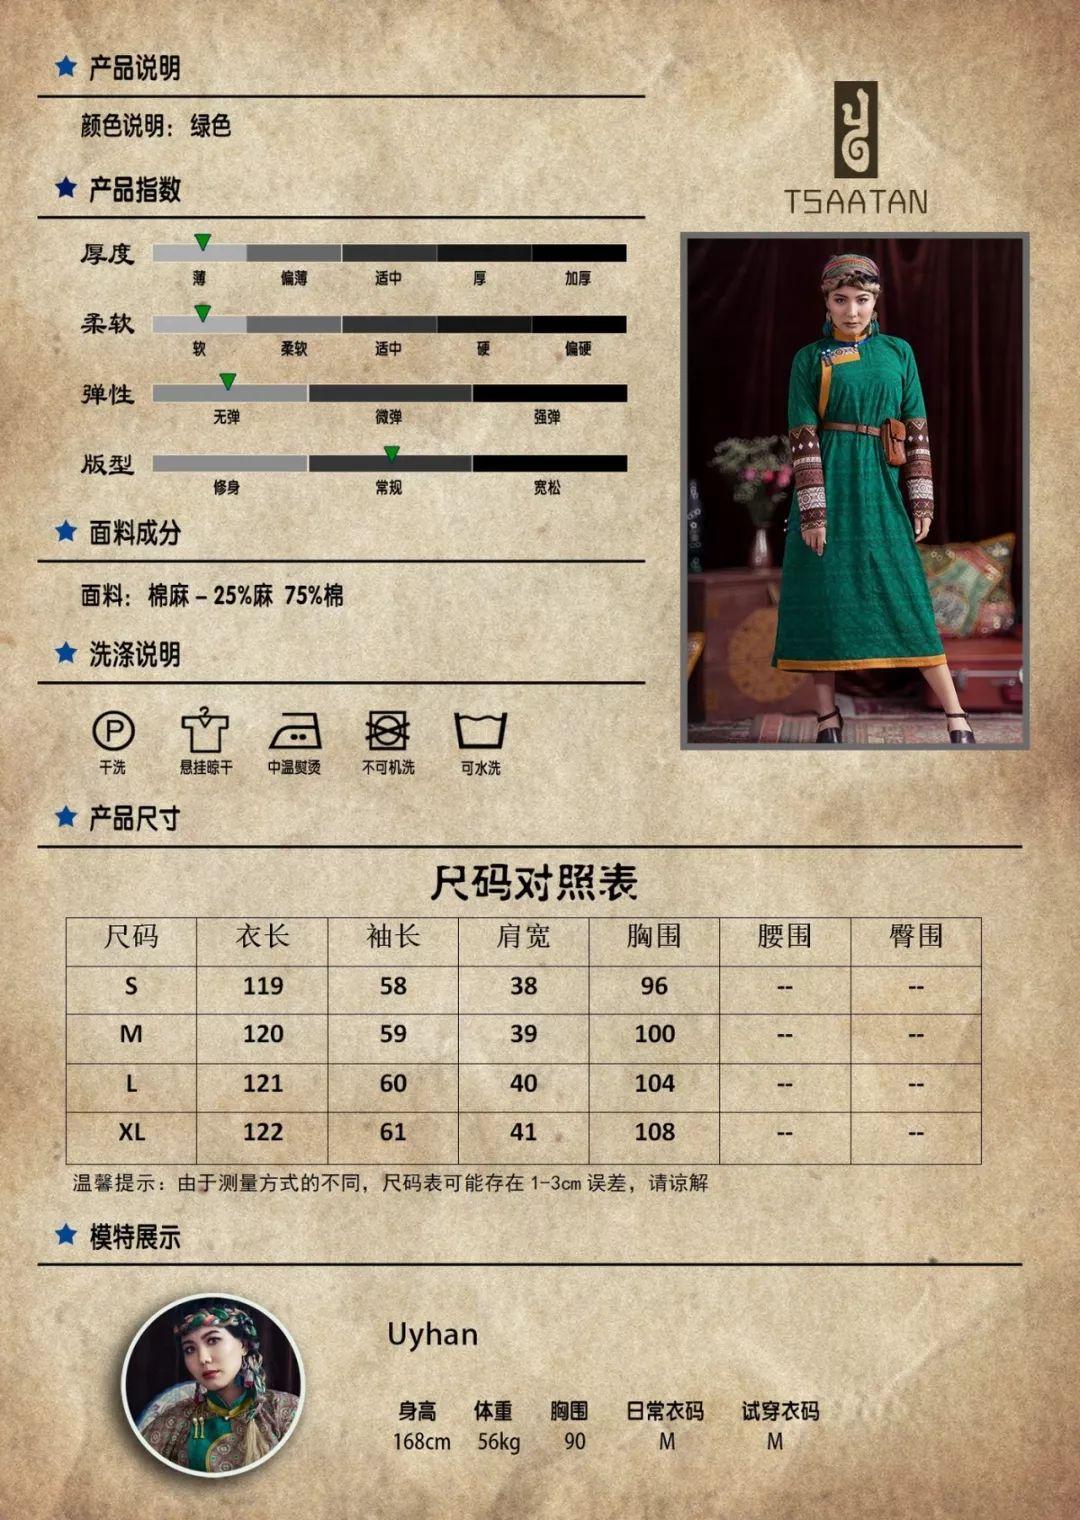 TSAATAN蒙古时装秋冬系列,来自驯鹿人的独特魅力! 第61张